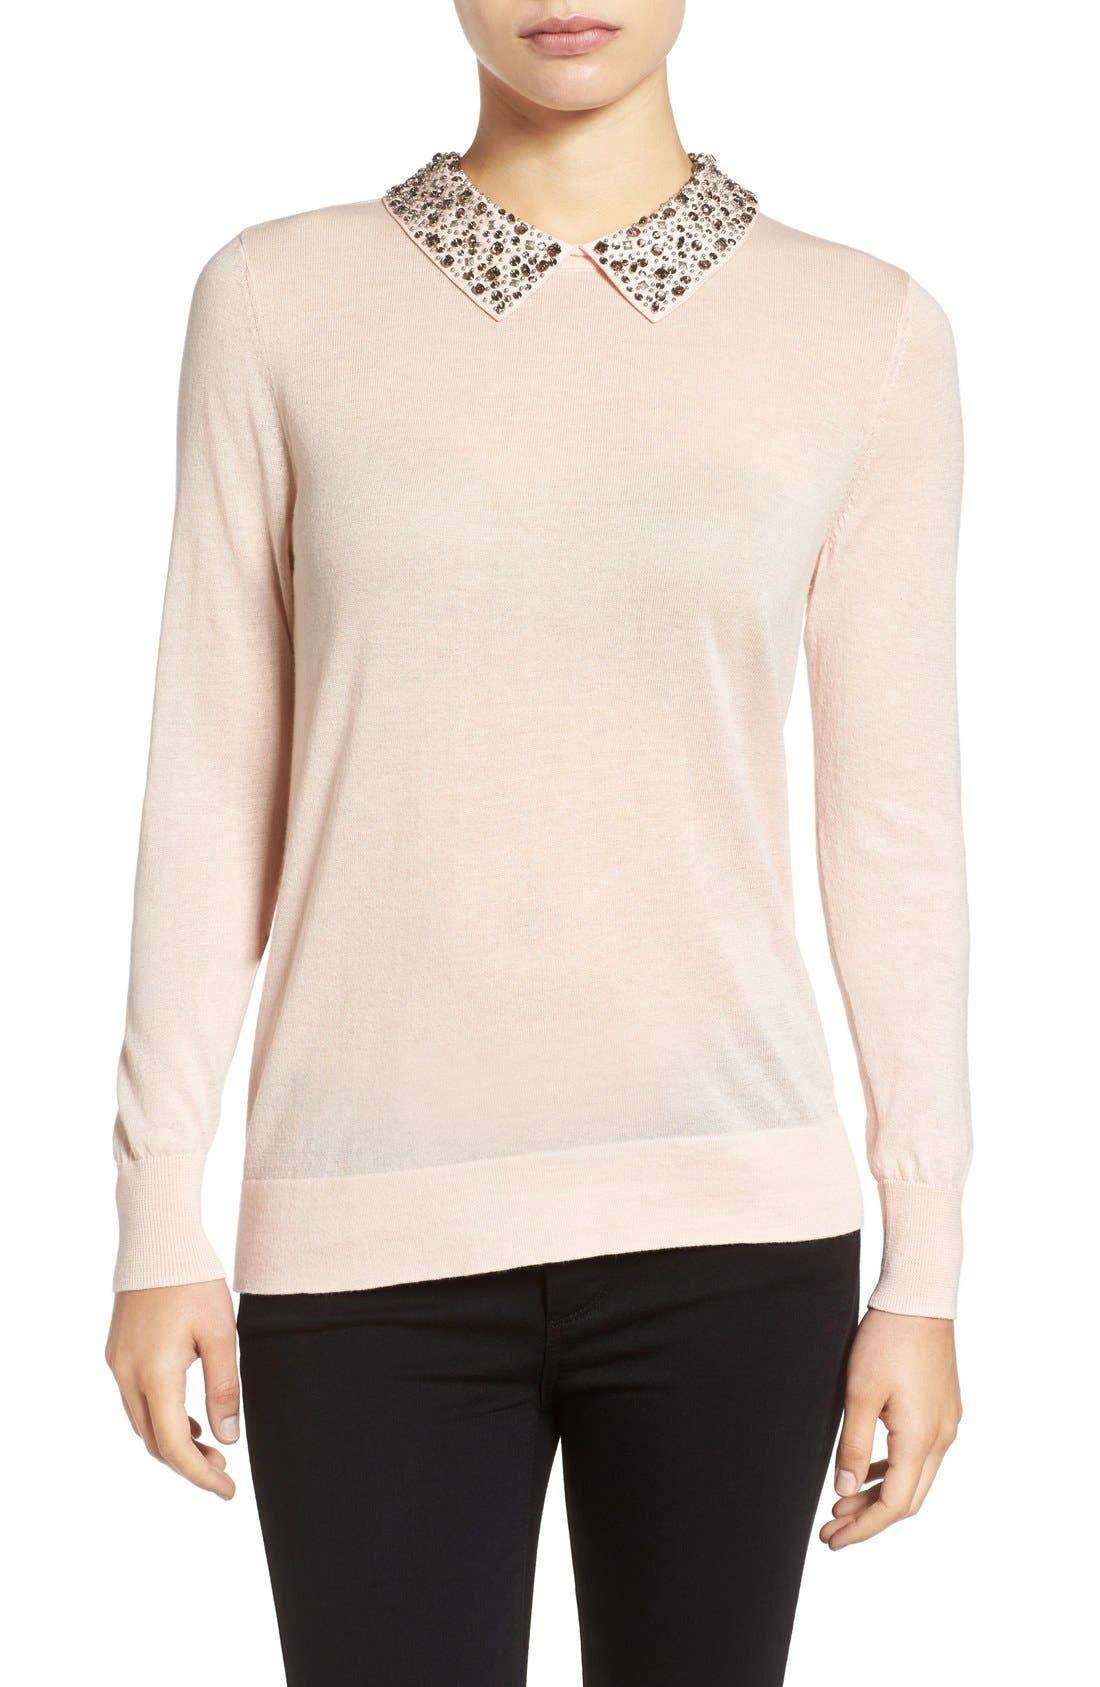 Alternate Image 1 Selected - Halogen® Embellished Collar Sweater (Regular & Petite)